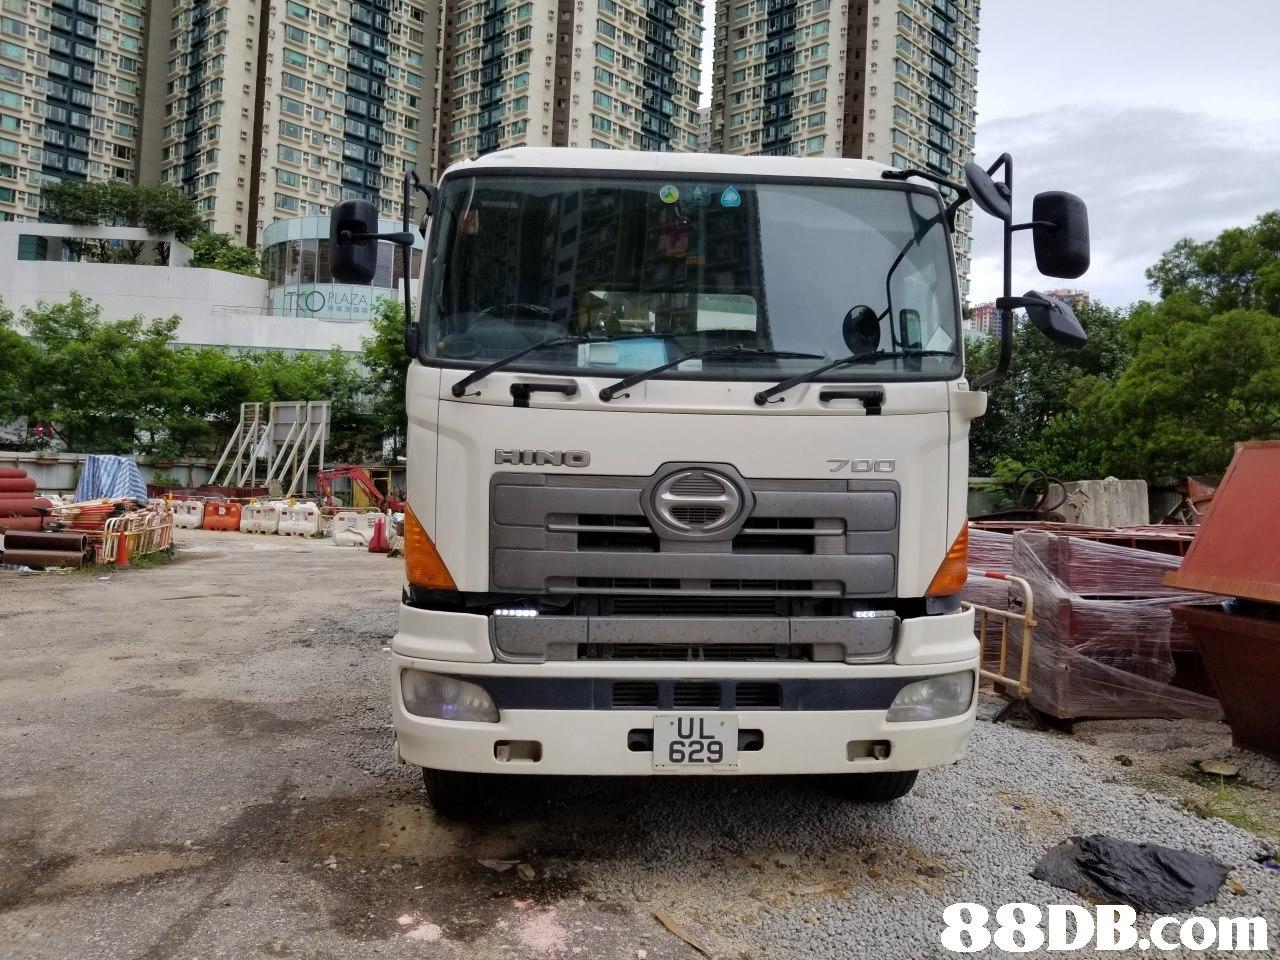 rPLAZA HINO 7D0 UL 629   Land vehicle,Vehicle,Transport,Commercial vehicle,Truck